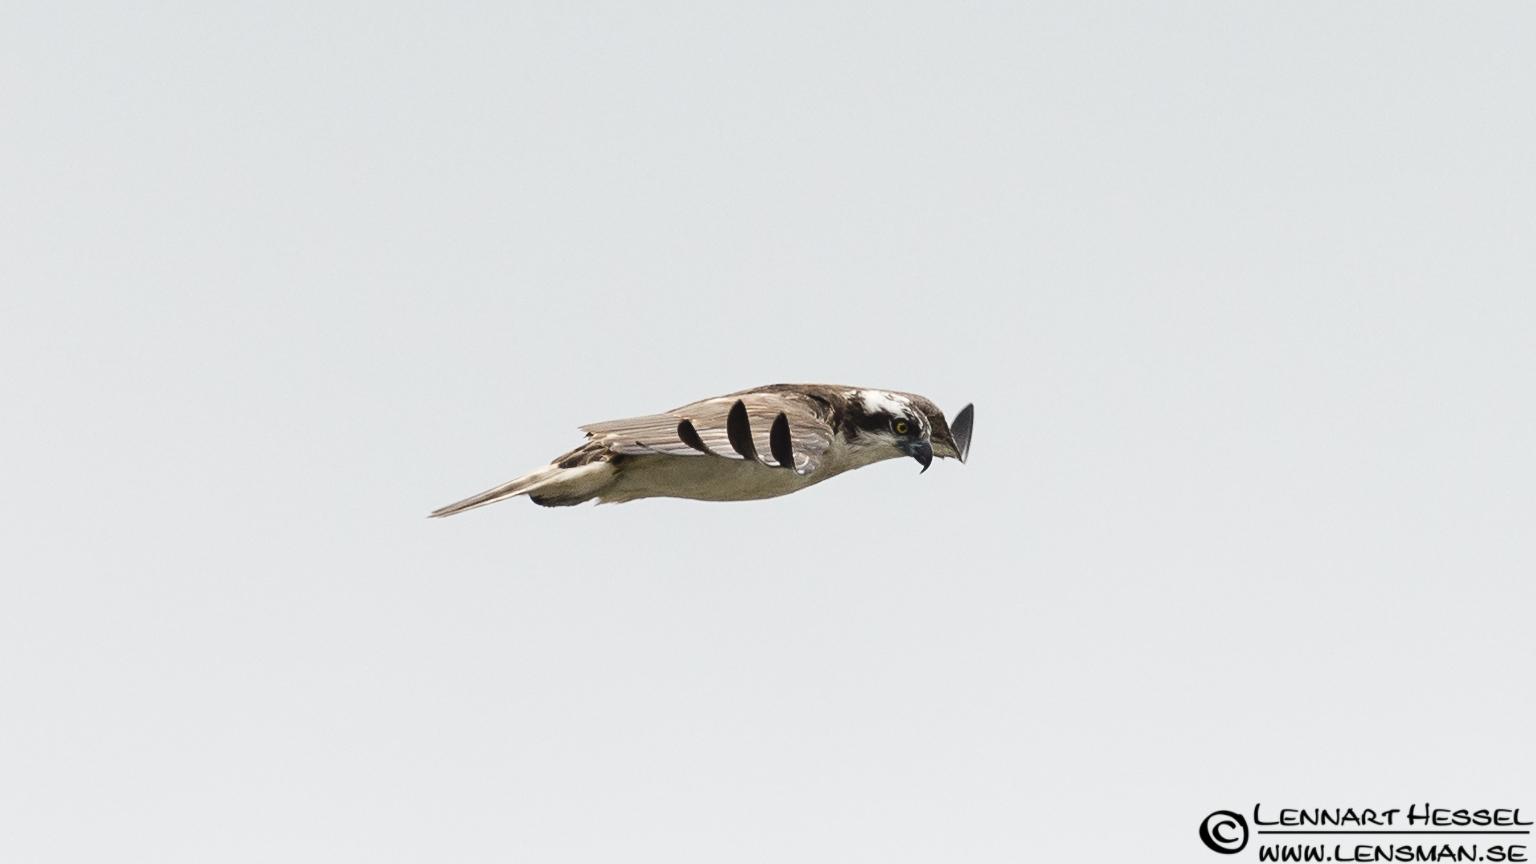 Osprey side view